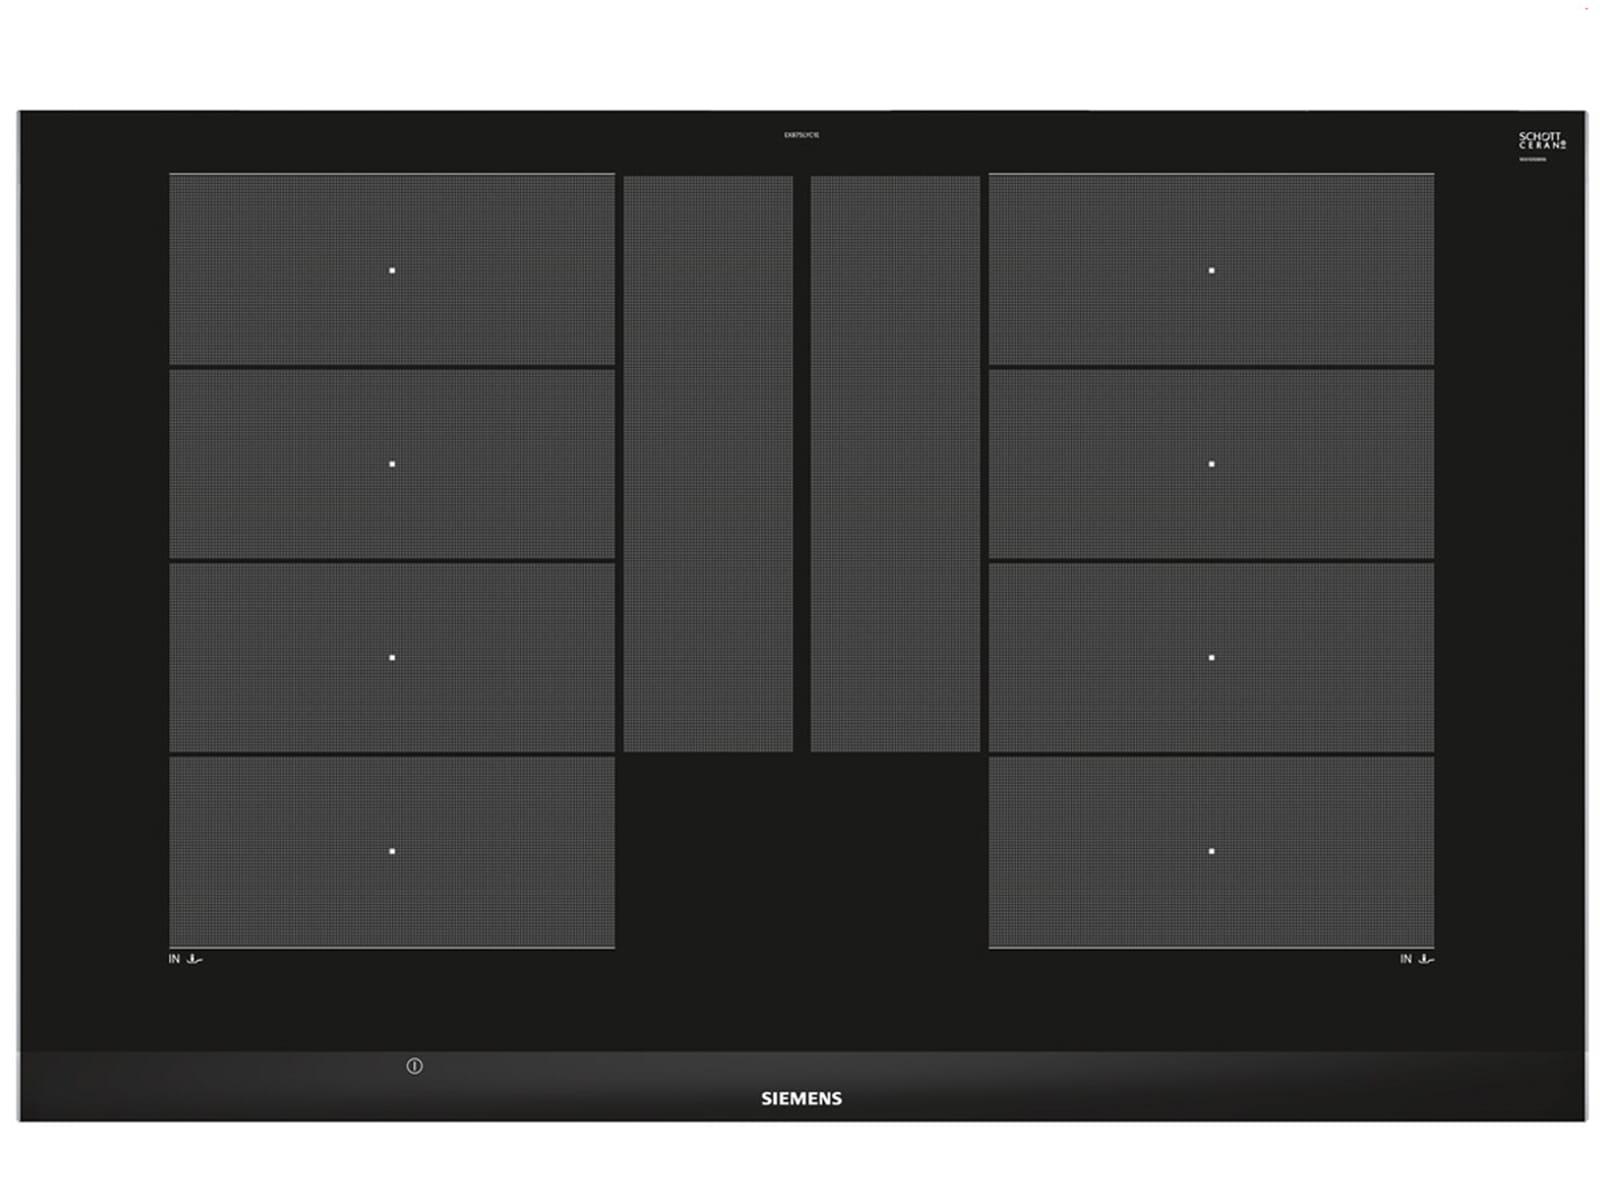 siemens ex875lyc1e induktionskochfeld autark. Black Bedroom Furniture Sets. Home Design Ideas